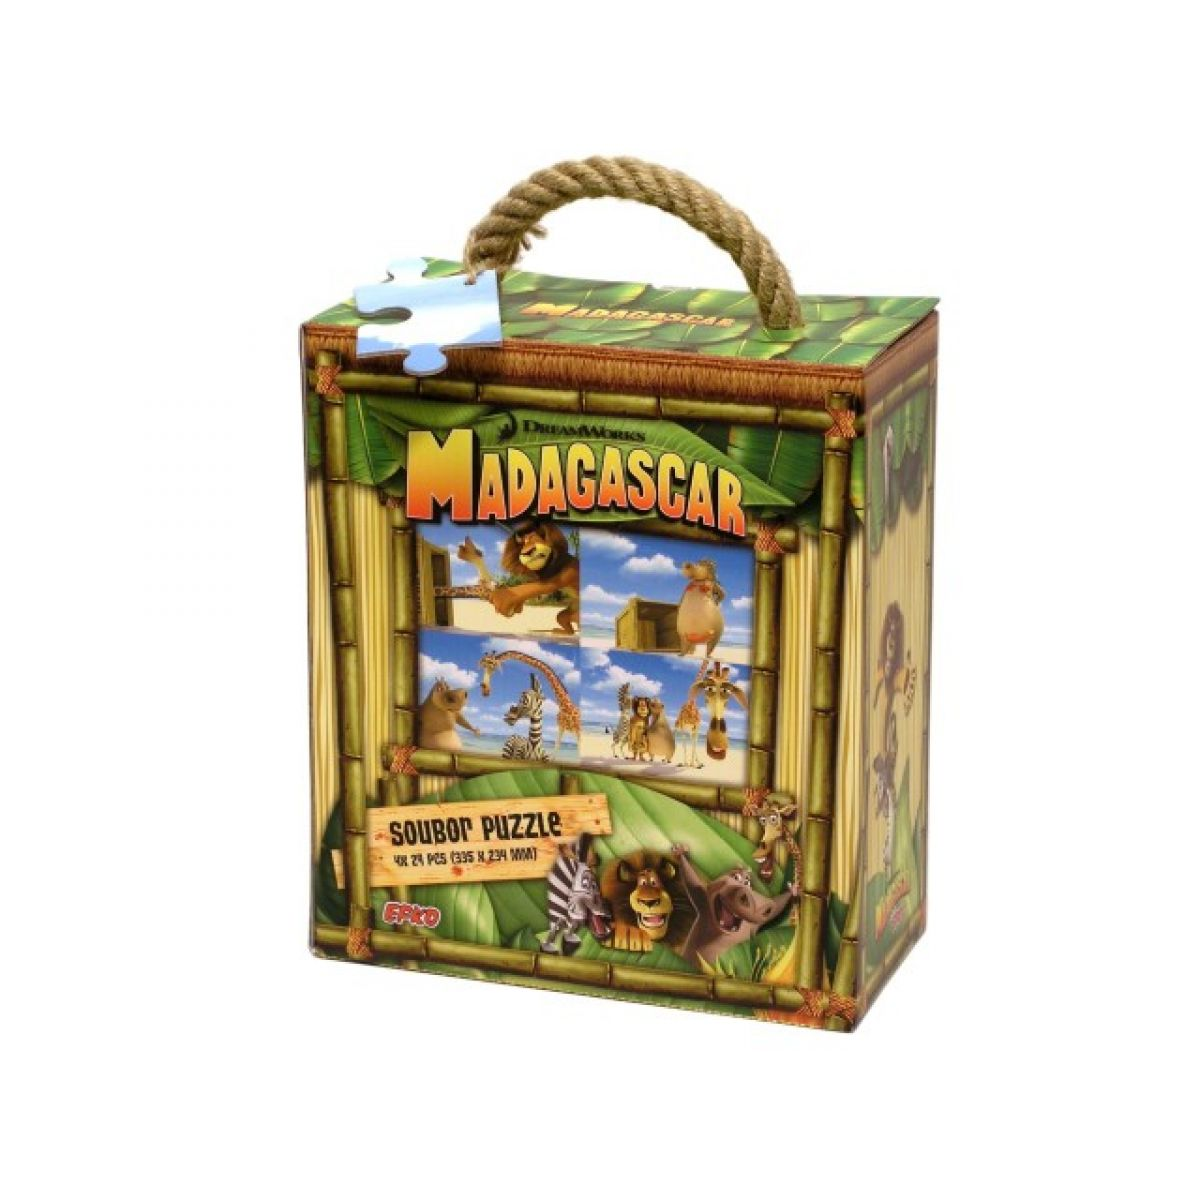 Madagascar Puzzle soubor 4x24d Efko